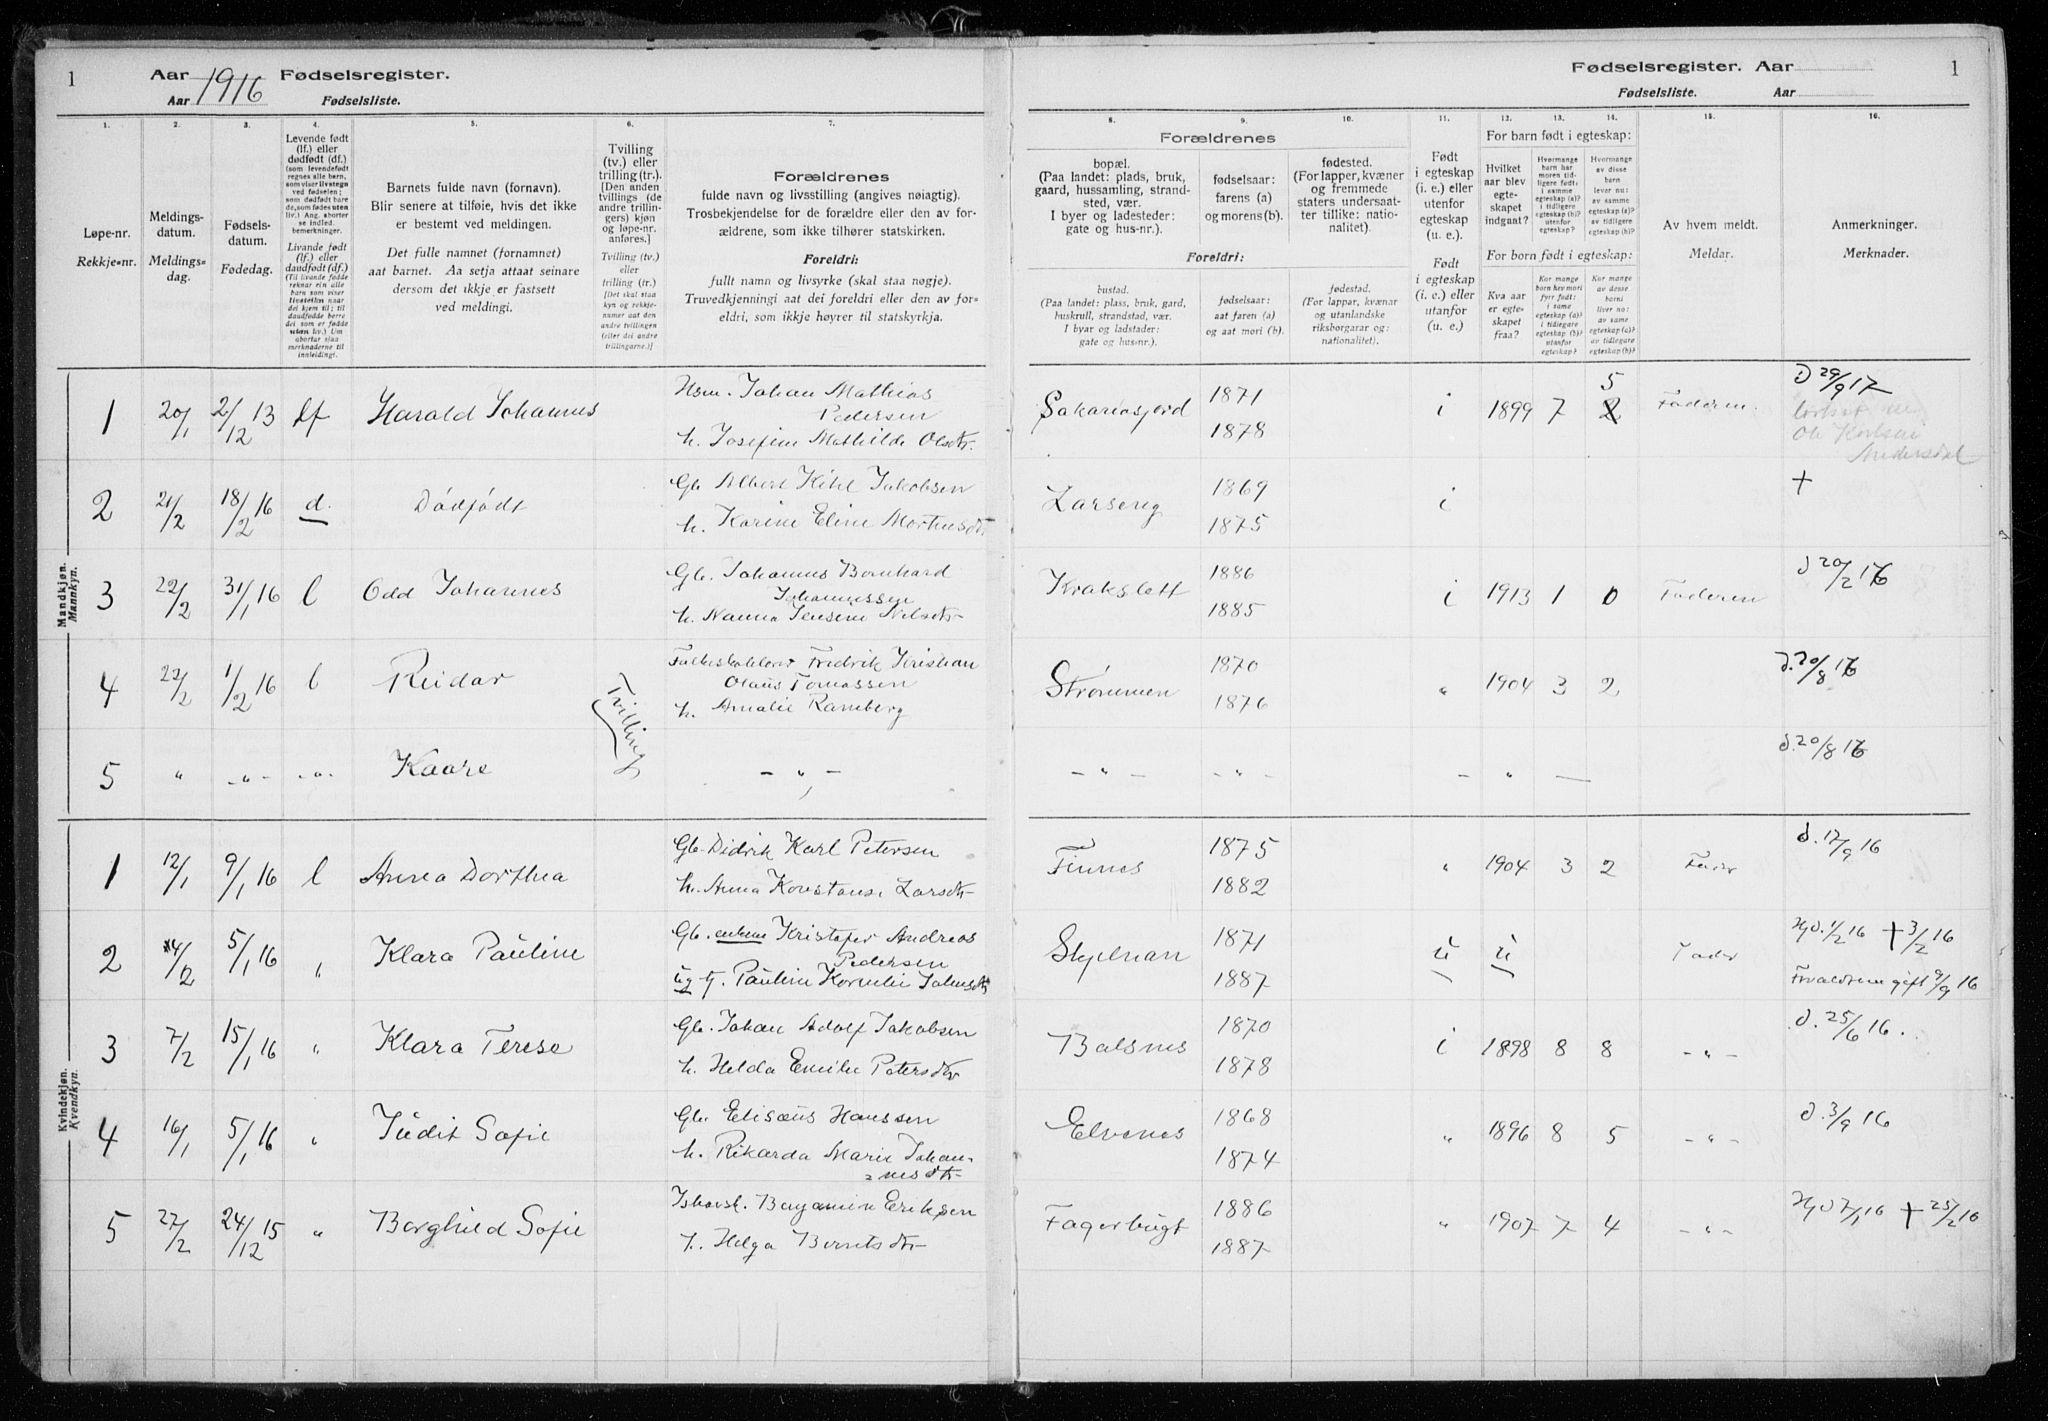 SATØ, Tromsøysund sokneprestkontor, H/Ha/L0079: Fødselsregister nr. 79, 1916-1924, s. 1